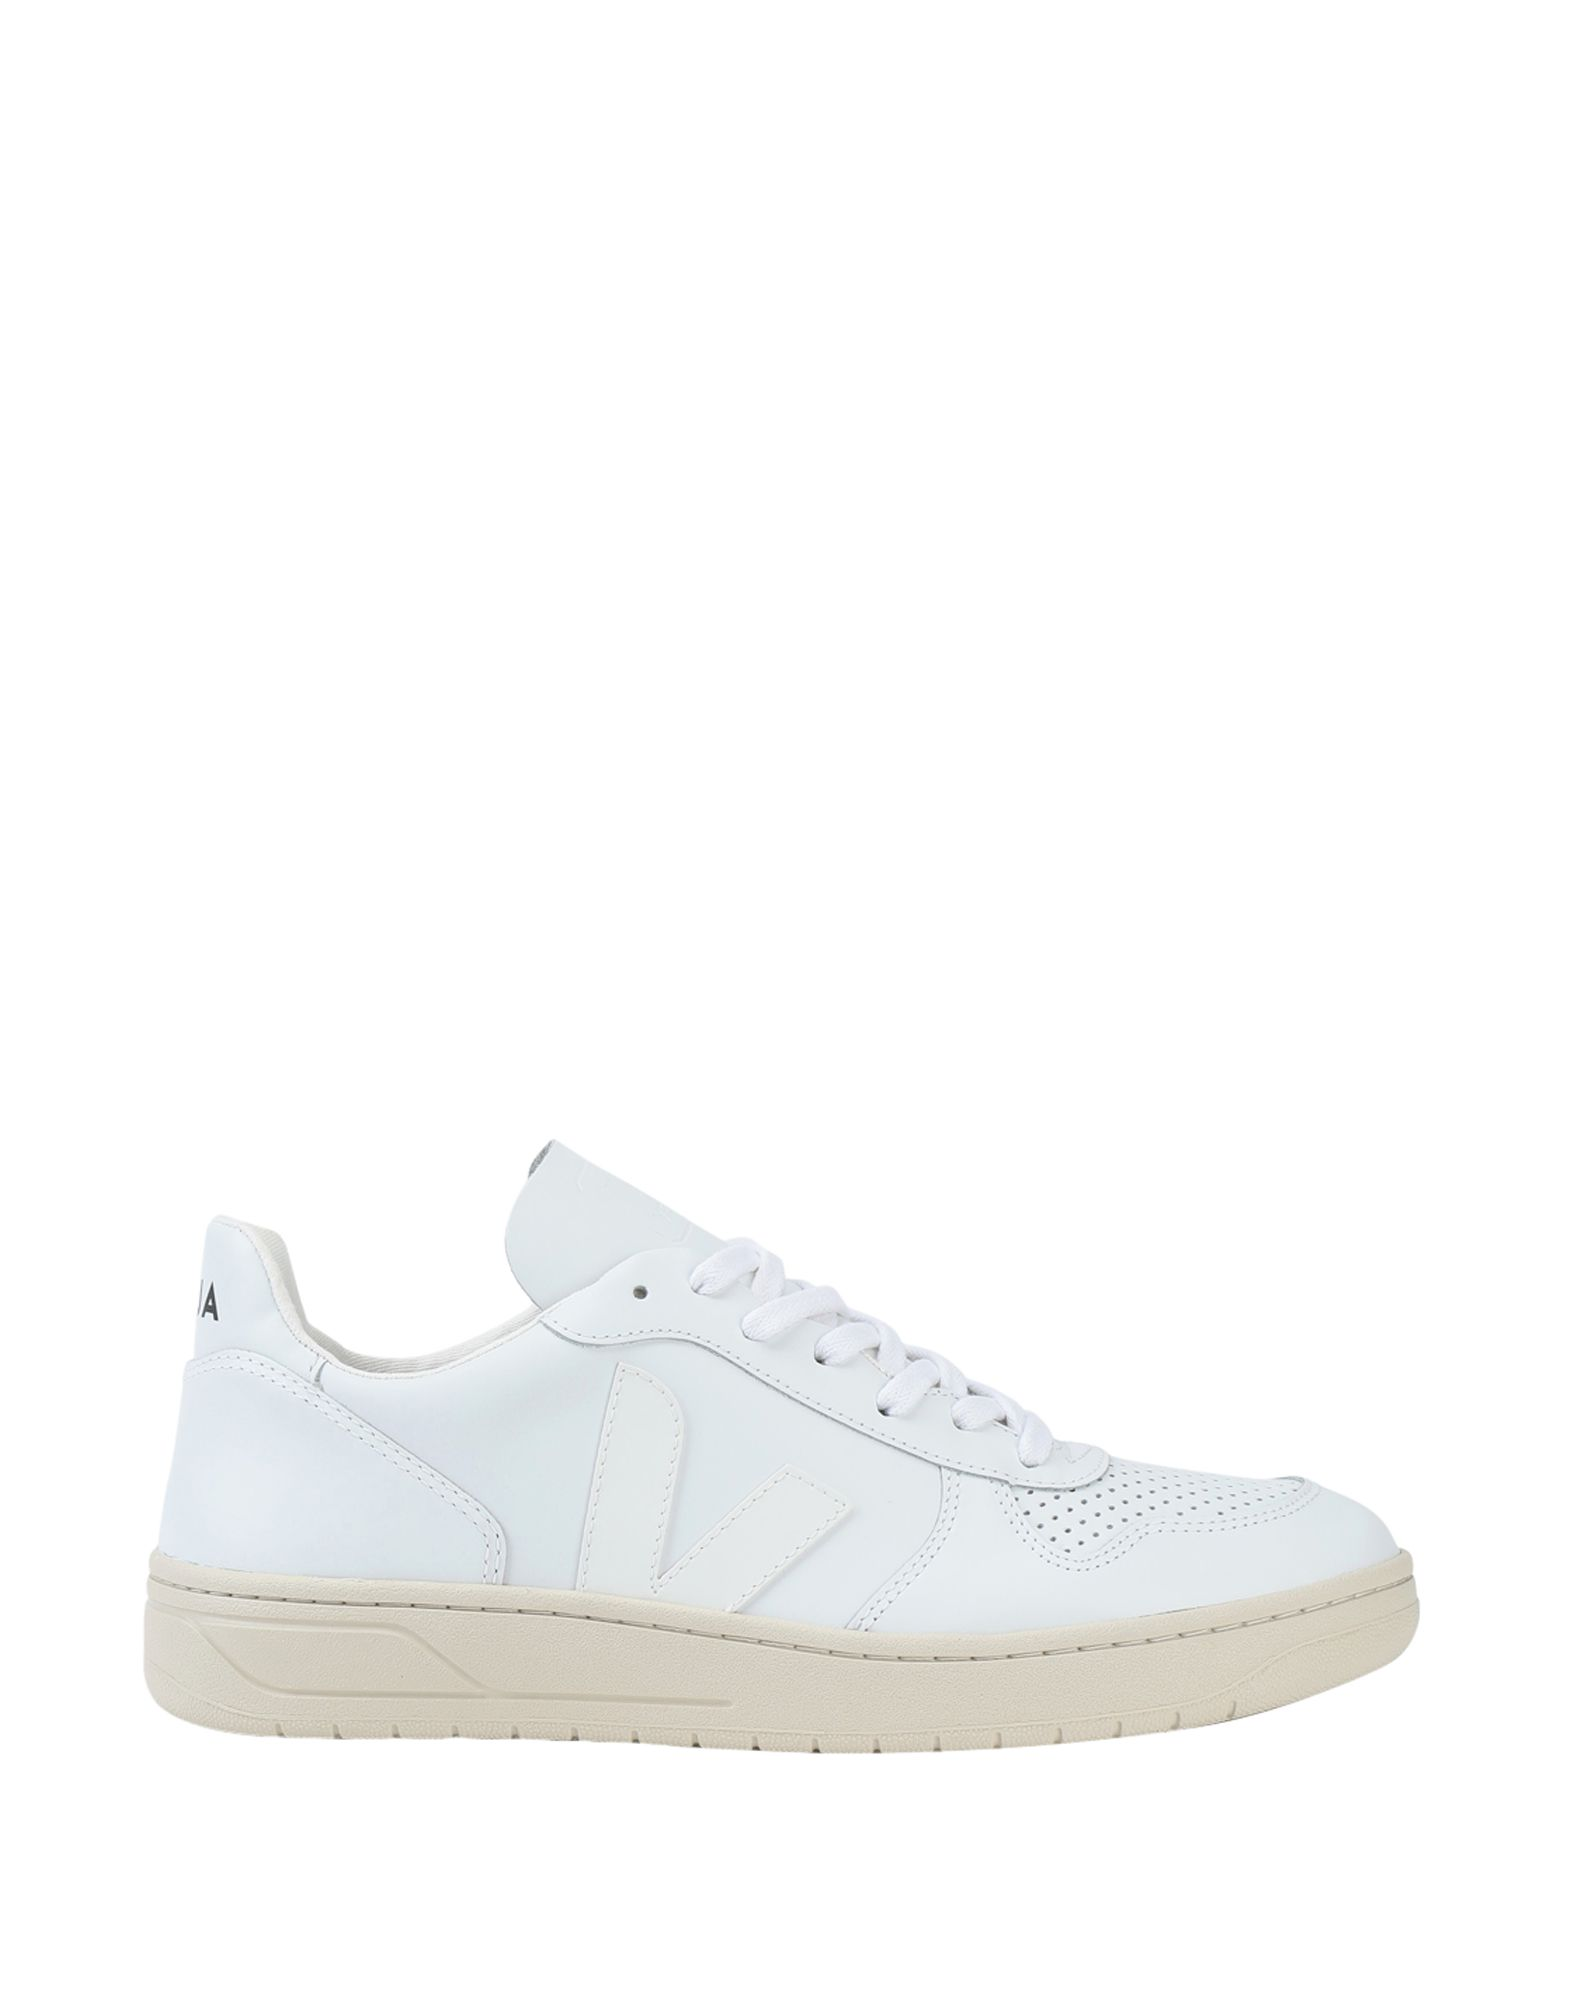 Veja Sneakers - Men Veja Sneakers - online on  Australia - Sneakers 11568294BX 28e0af